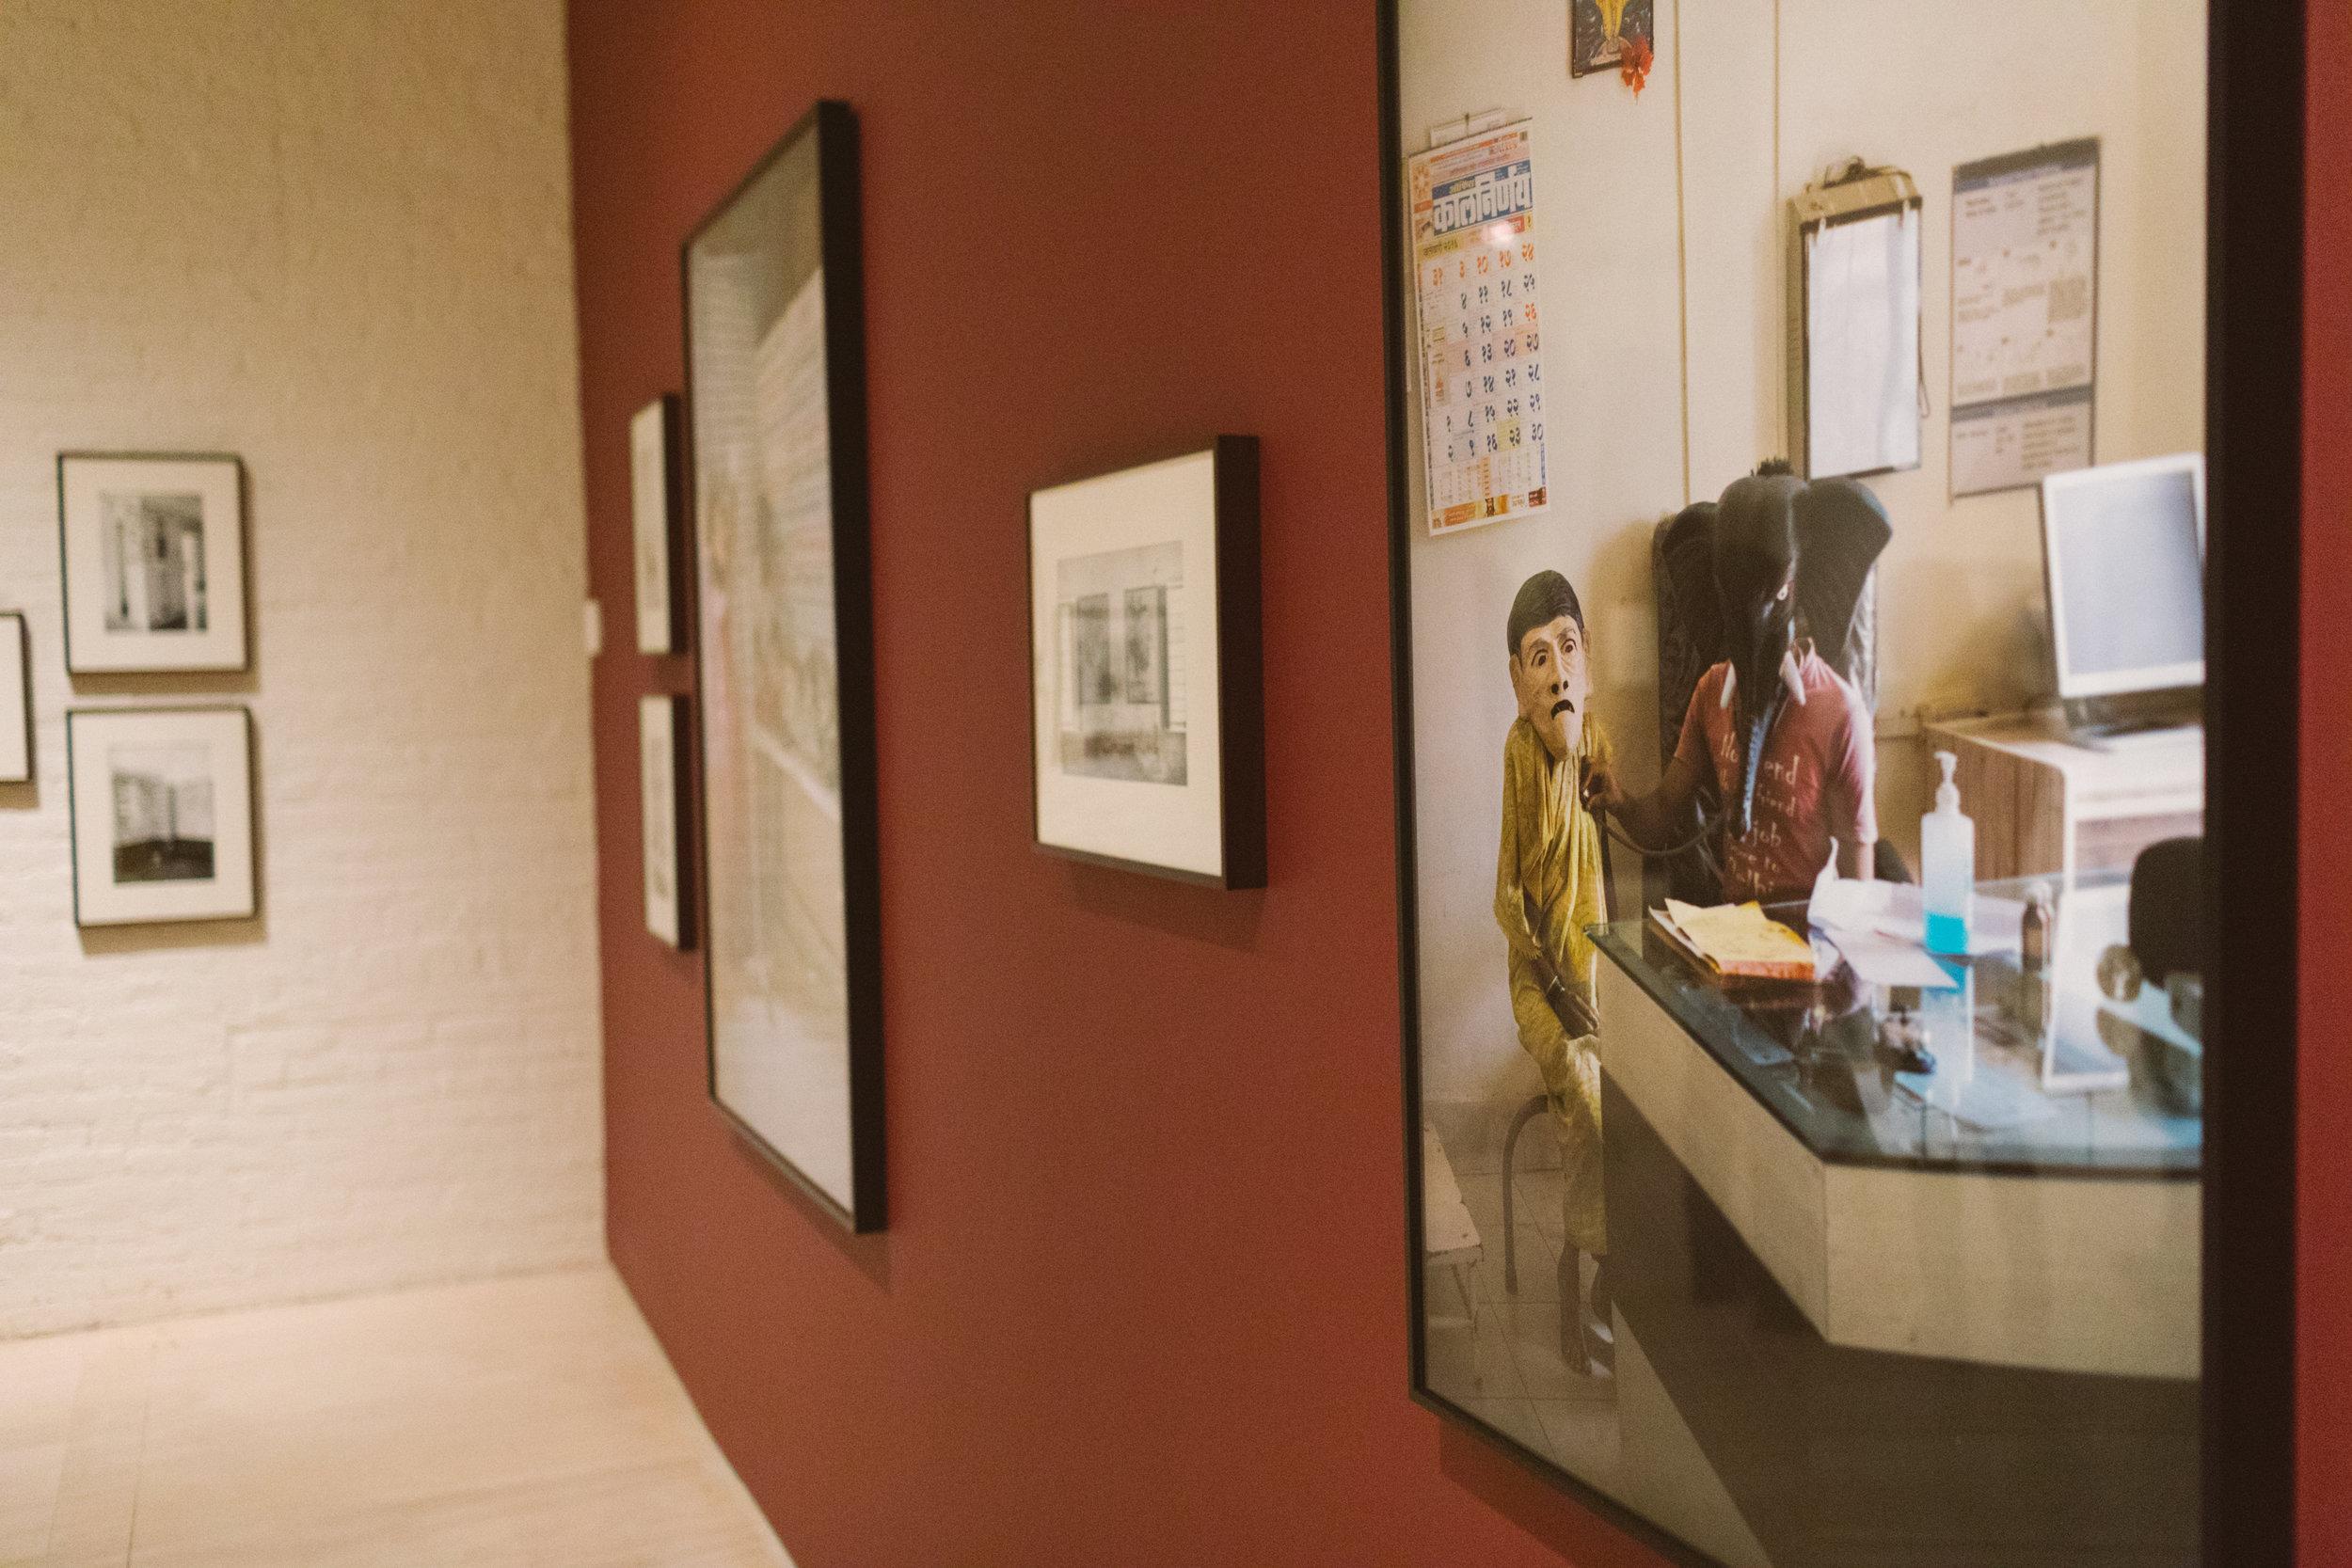 1013.shewanders.loves.new.york.art.museums.jpg